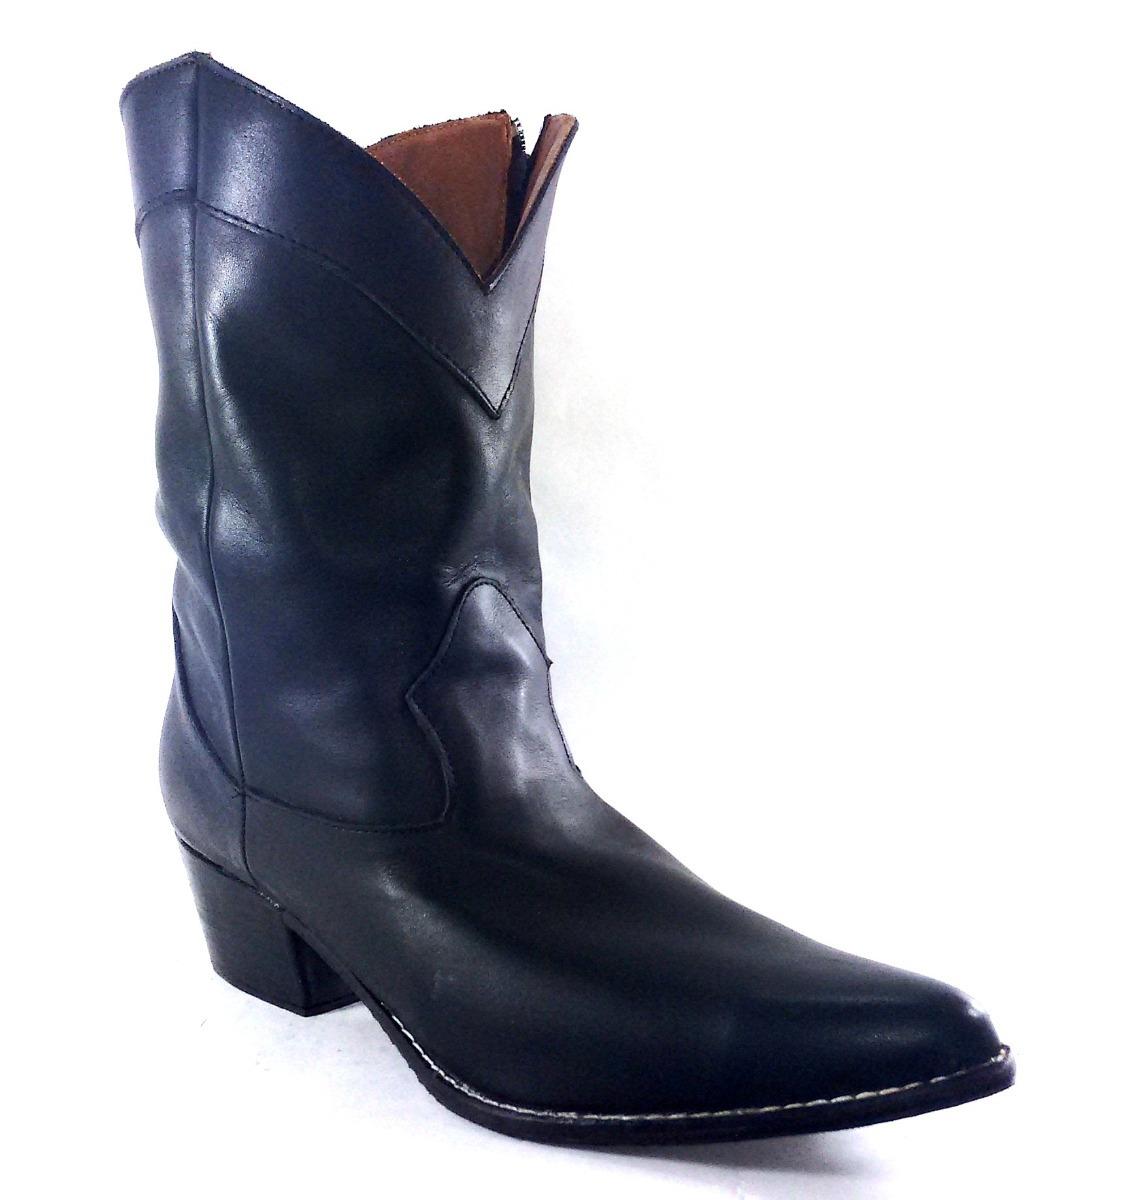 7b3abb7b2 sam123 botas cortas mujer talle grande oferta tex negras. Cargando zoom.